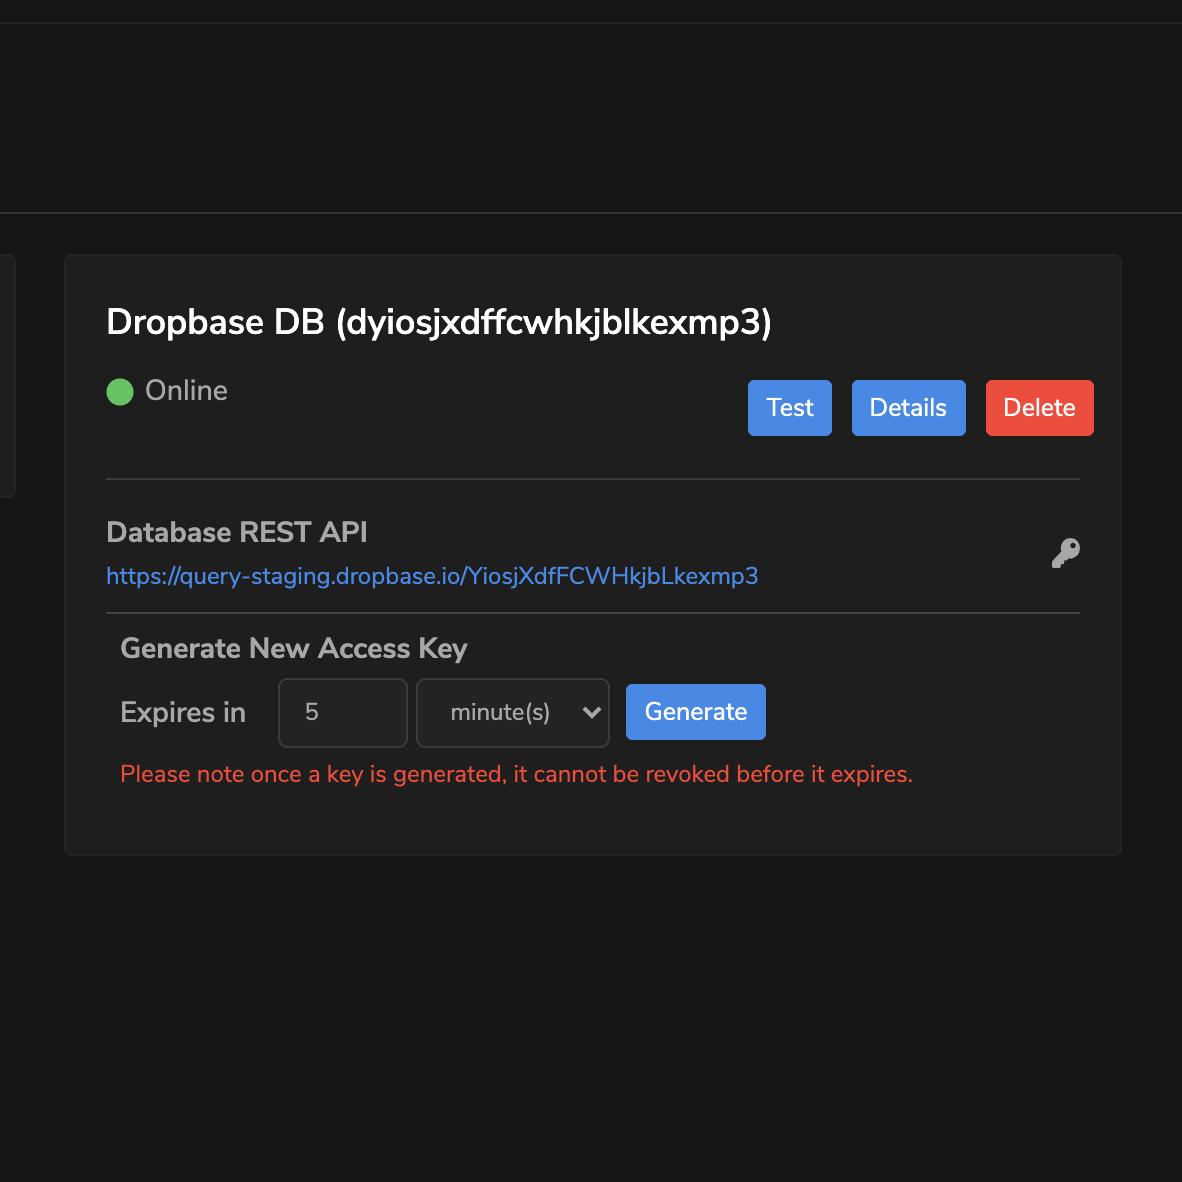 Dropbaser Database REST API